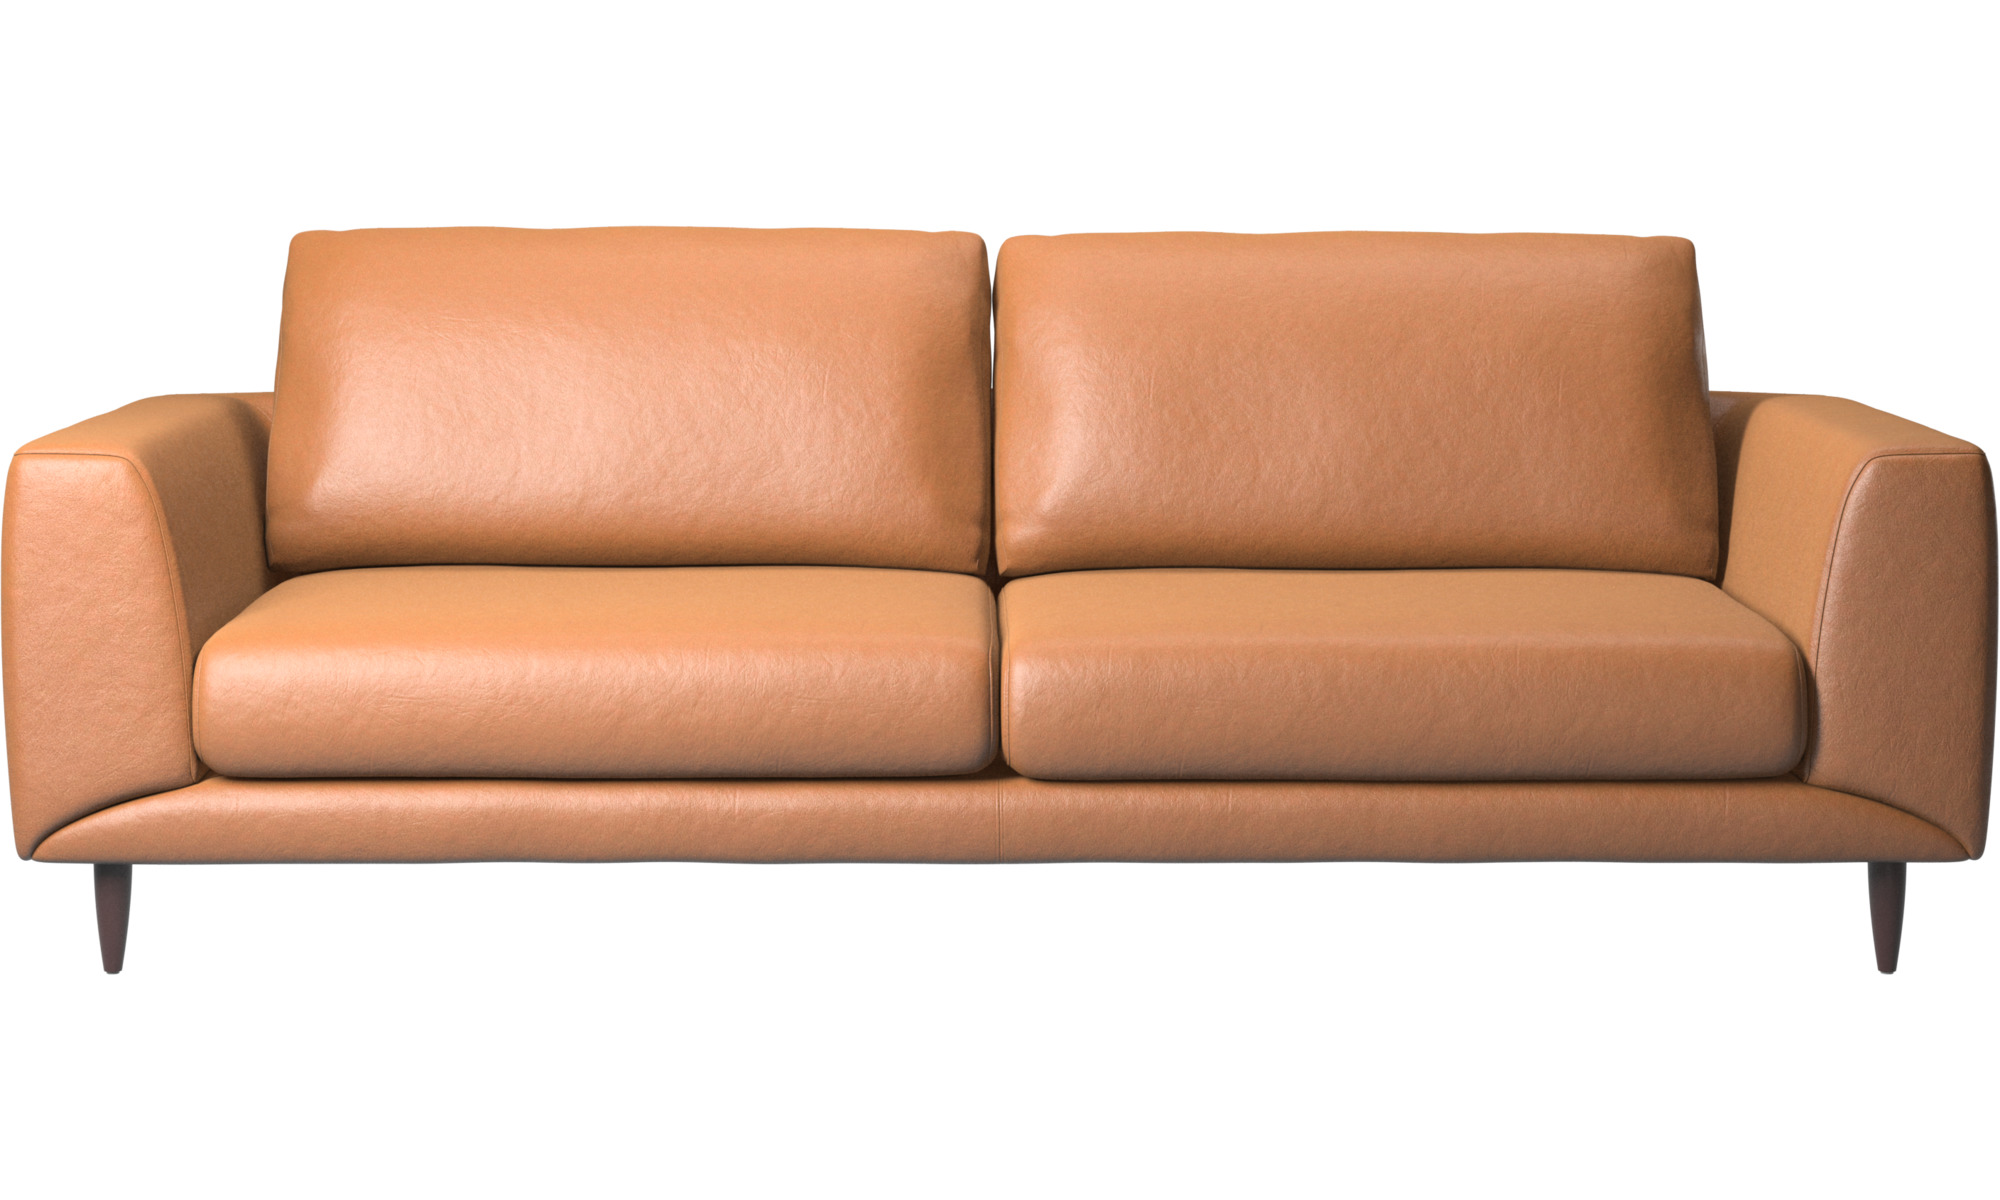 3 personers sofaer - Fargo sofa - Brun - Læder